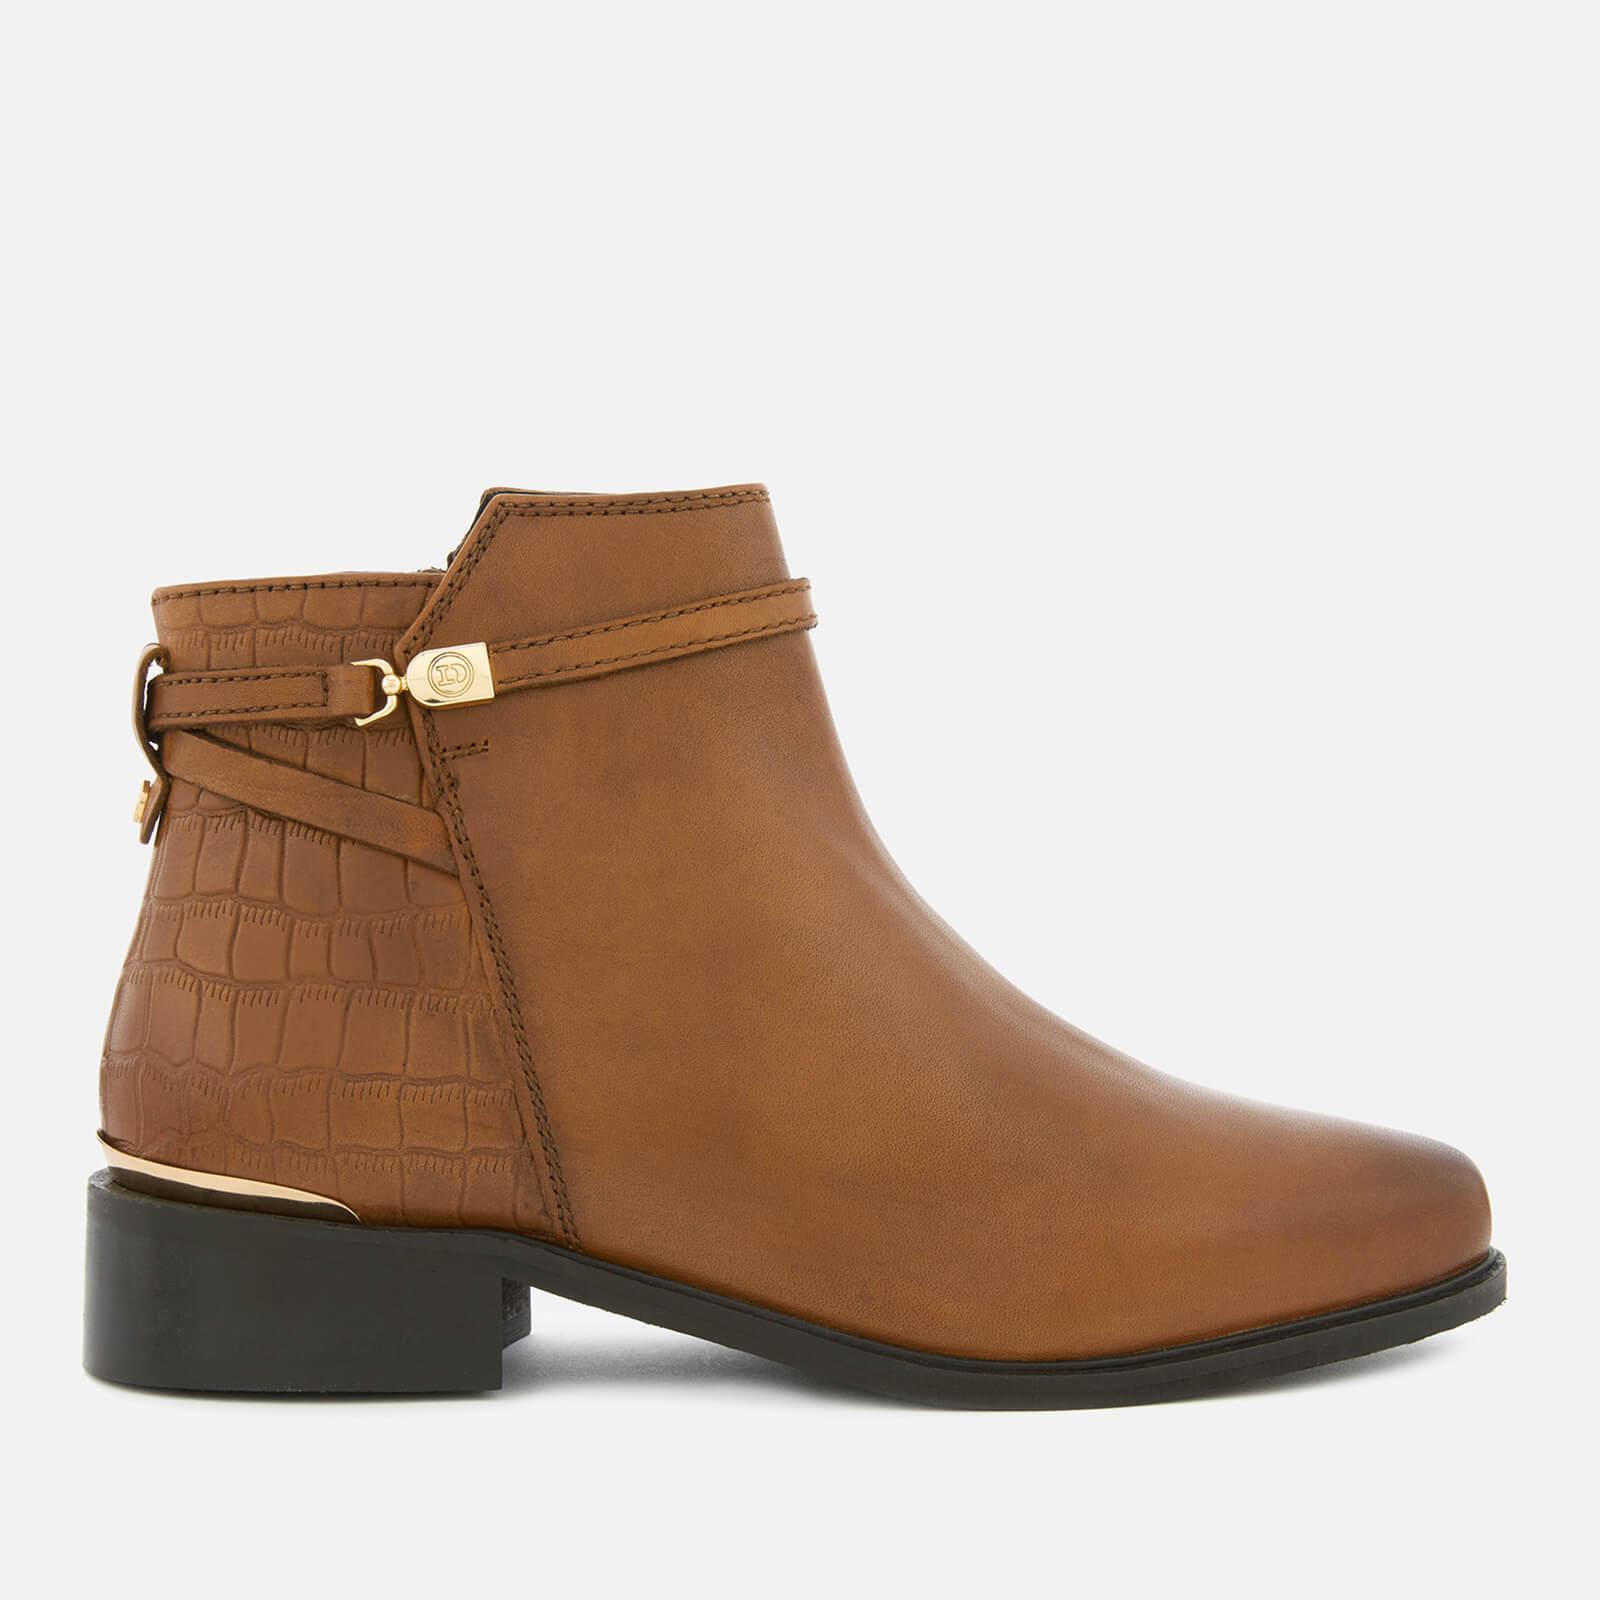 Dune Women S Peppey Leather Flat Ankle Boots Tan Womens Footwear